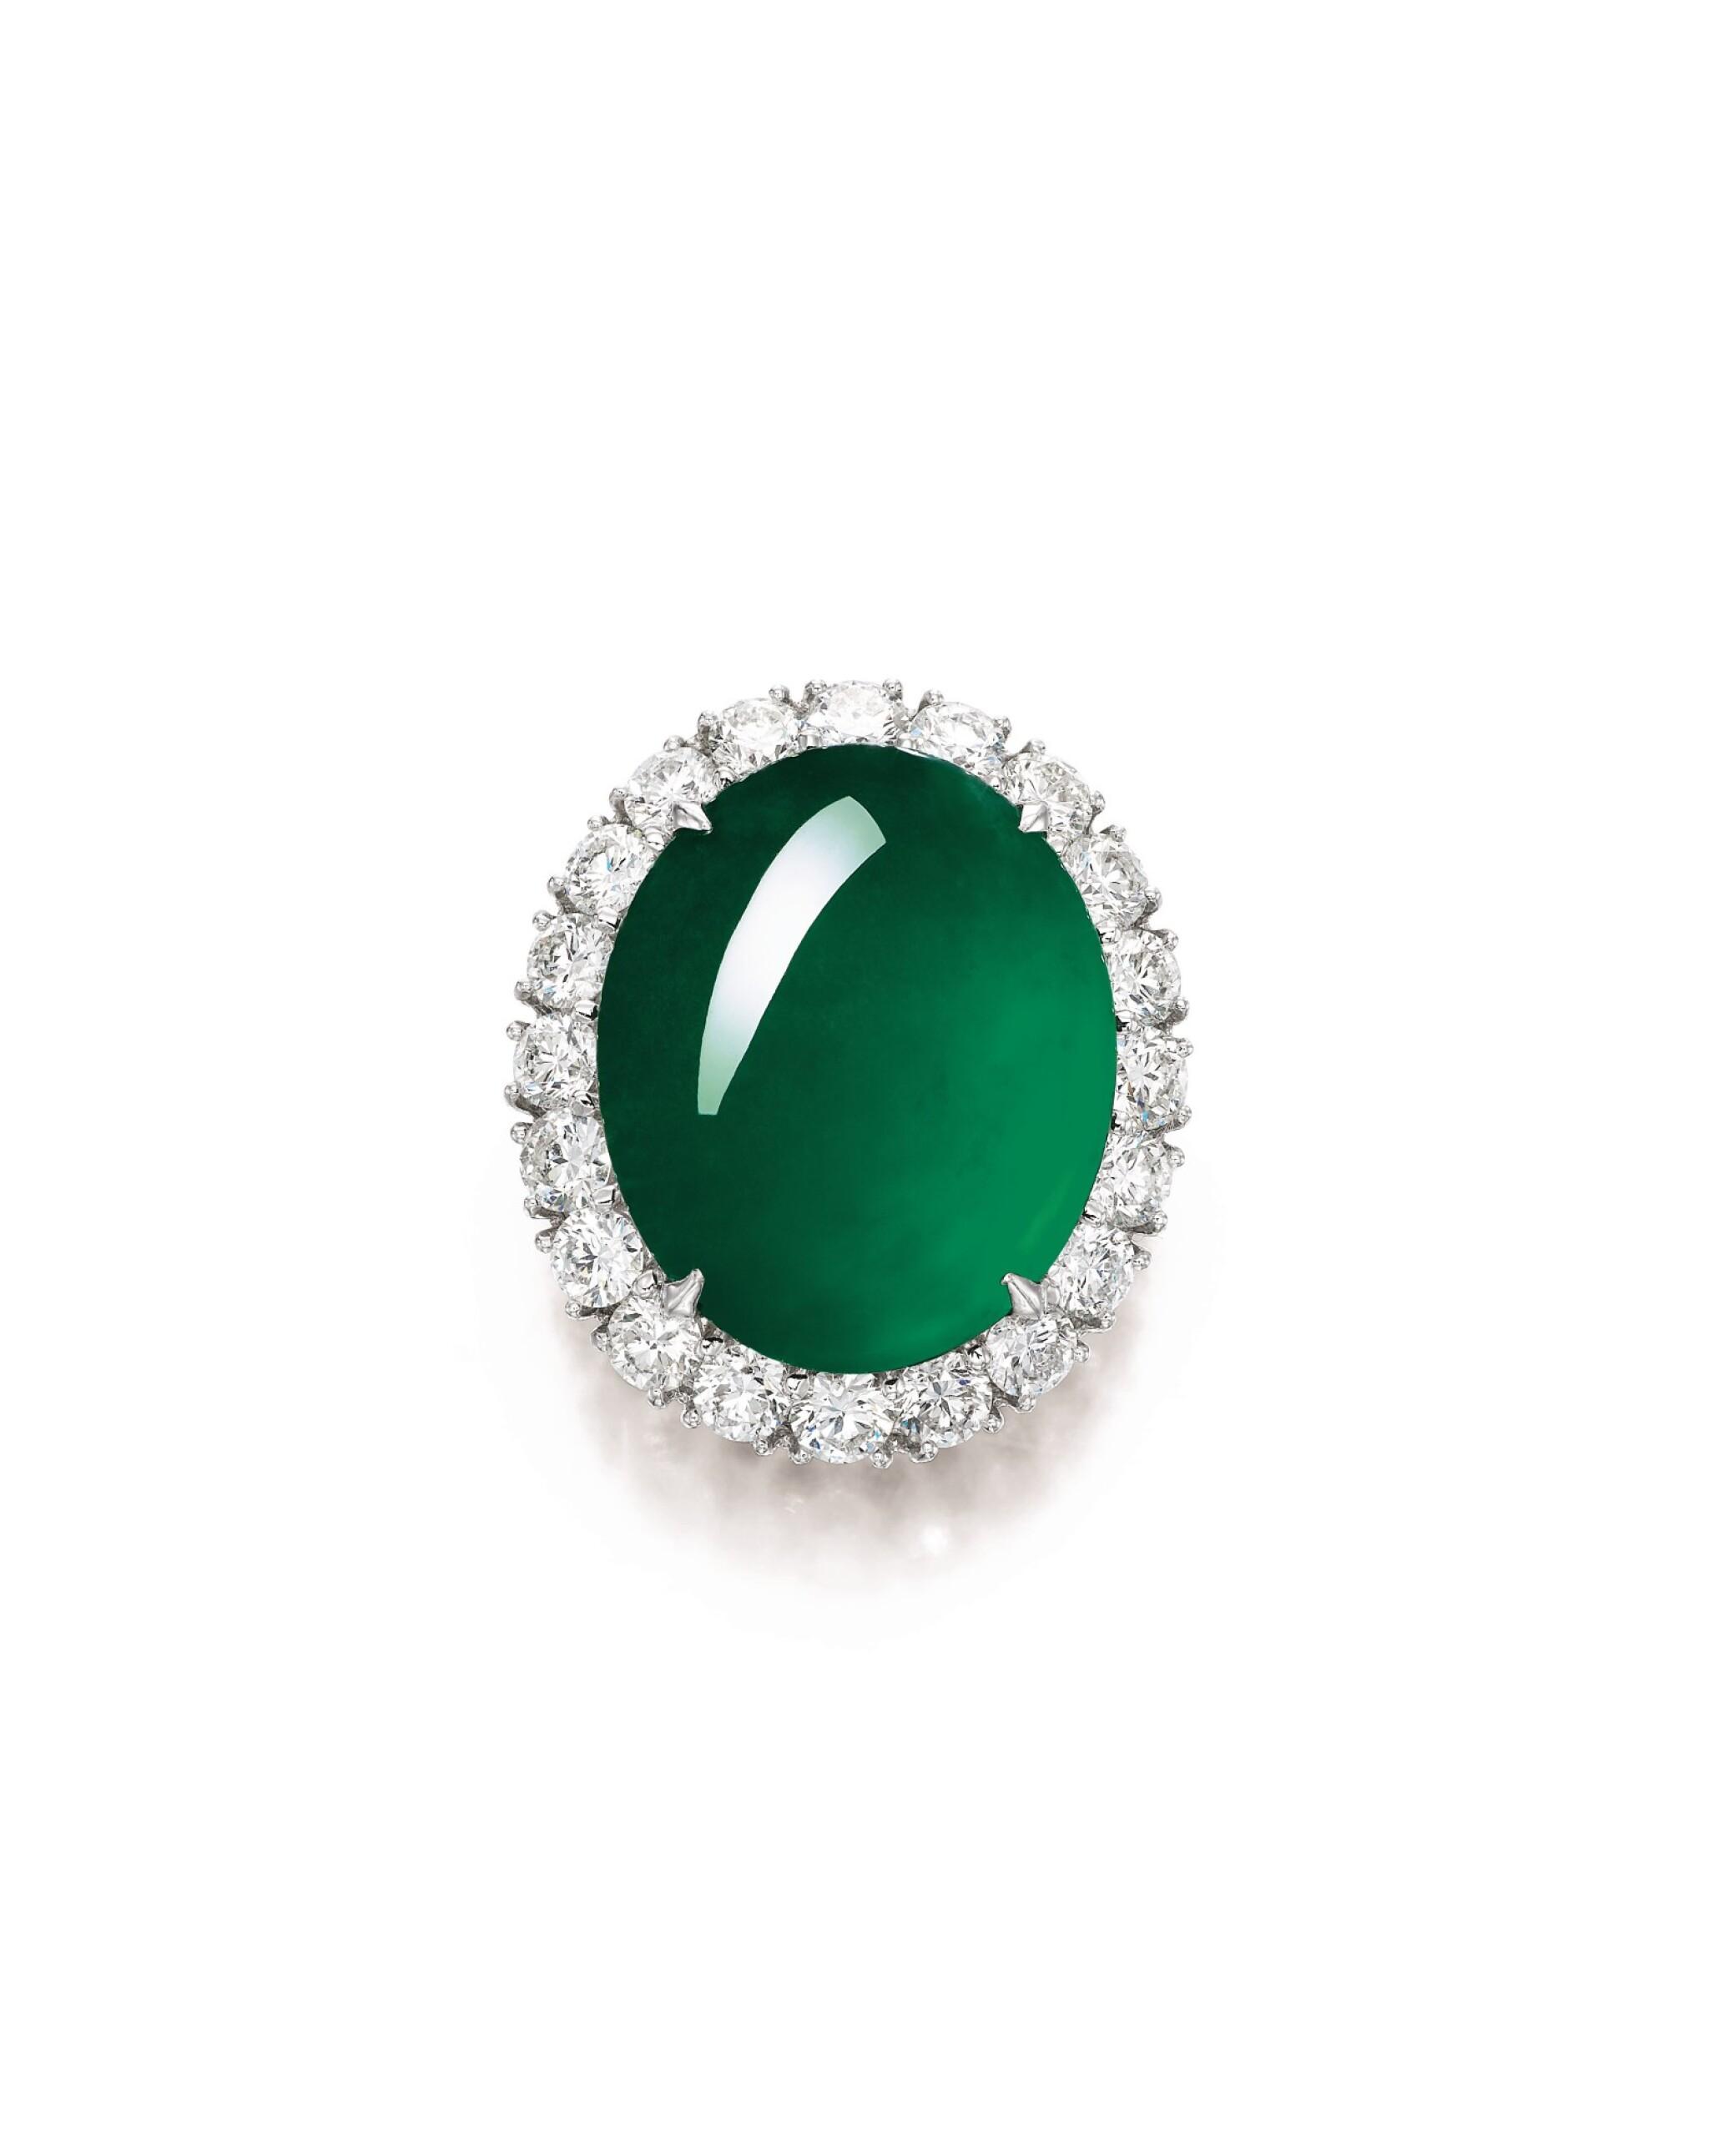 View full screen - View 1 of Lot 1688. Imperial Green Jadeite and Diamond Ring / Pendant | 天然「帝王綠」翡翠 配 鑽石 戒指 / 吊墜.